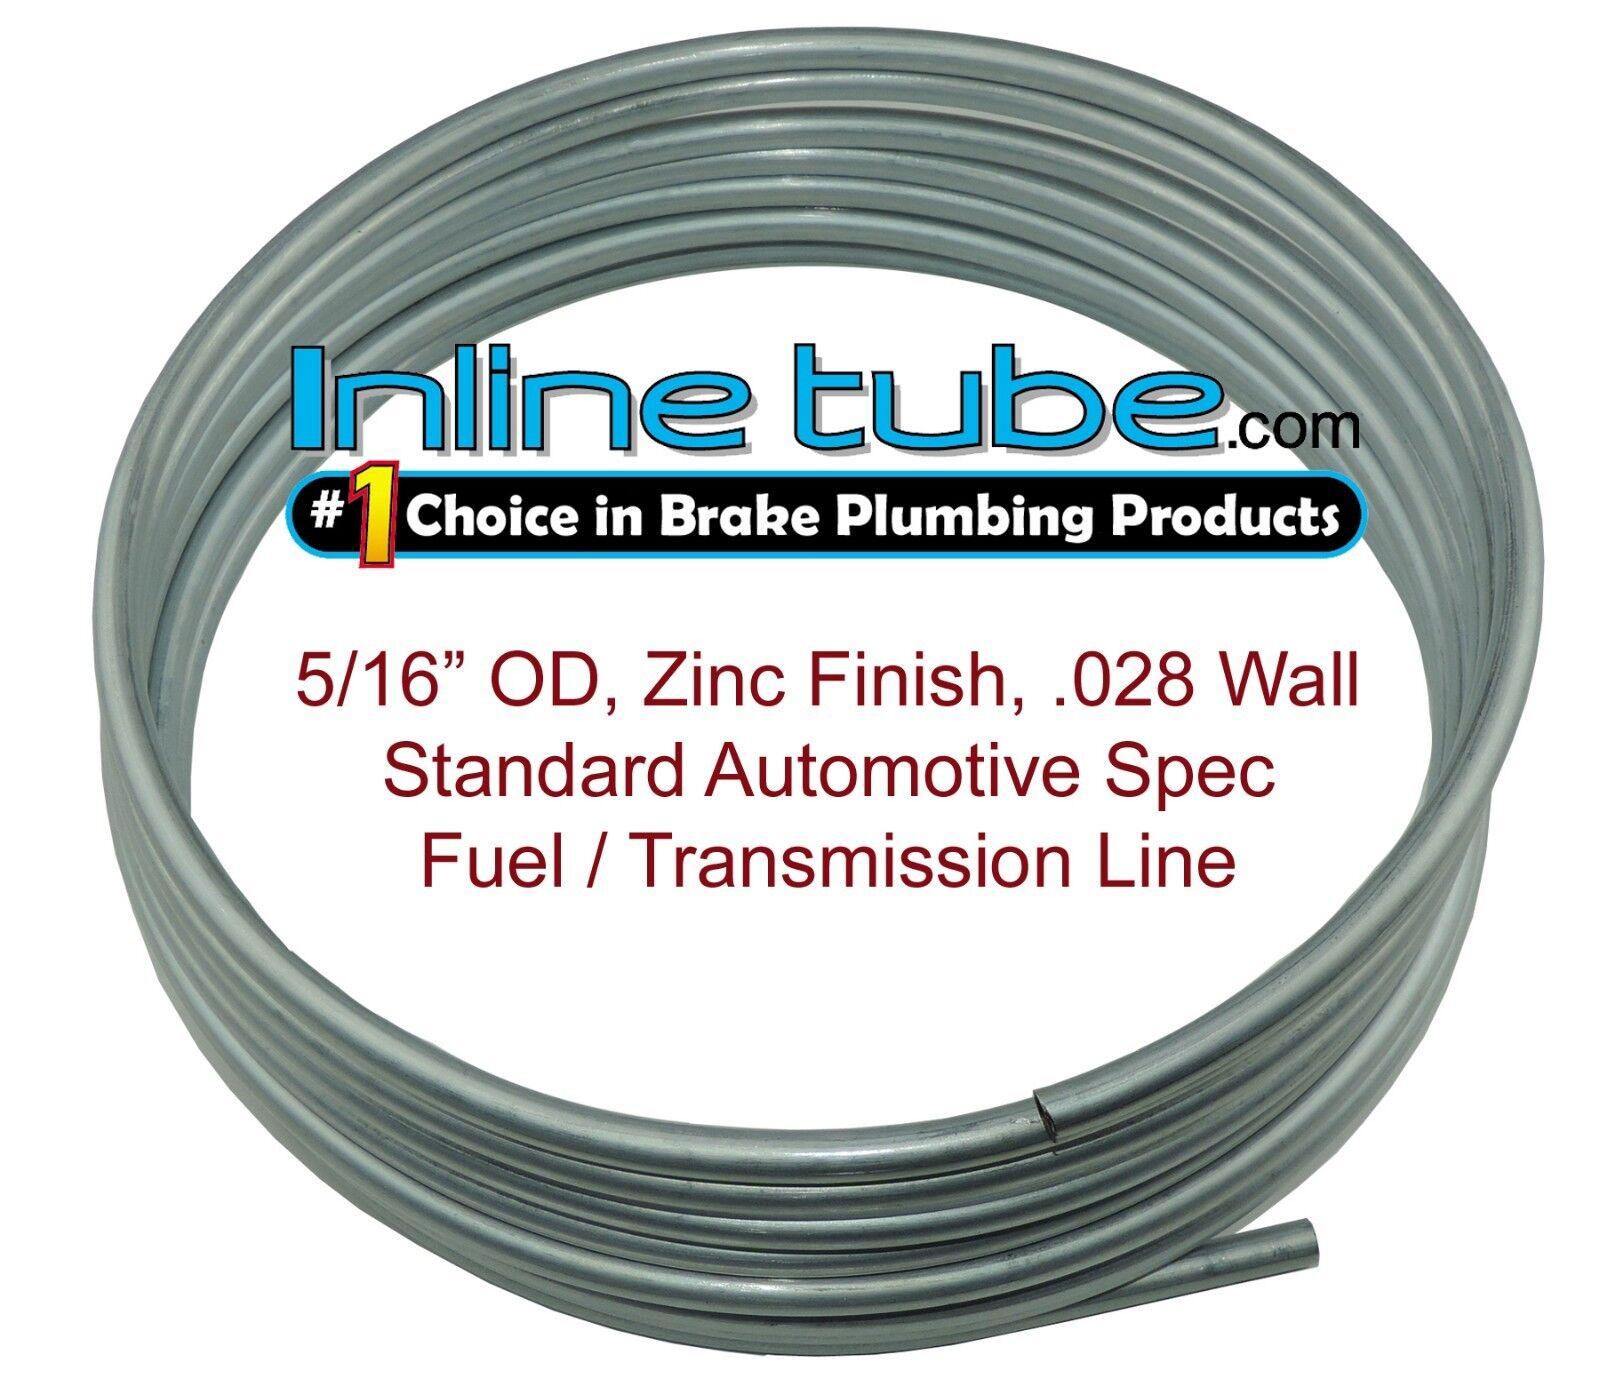 OEM Zinc Steel Brake Line Tubing Kit 3//16 OD Coil Roll /& SAE Tube Nut Fittings L-2-1 + L-3-2